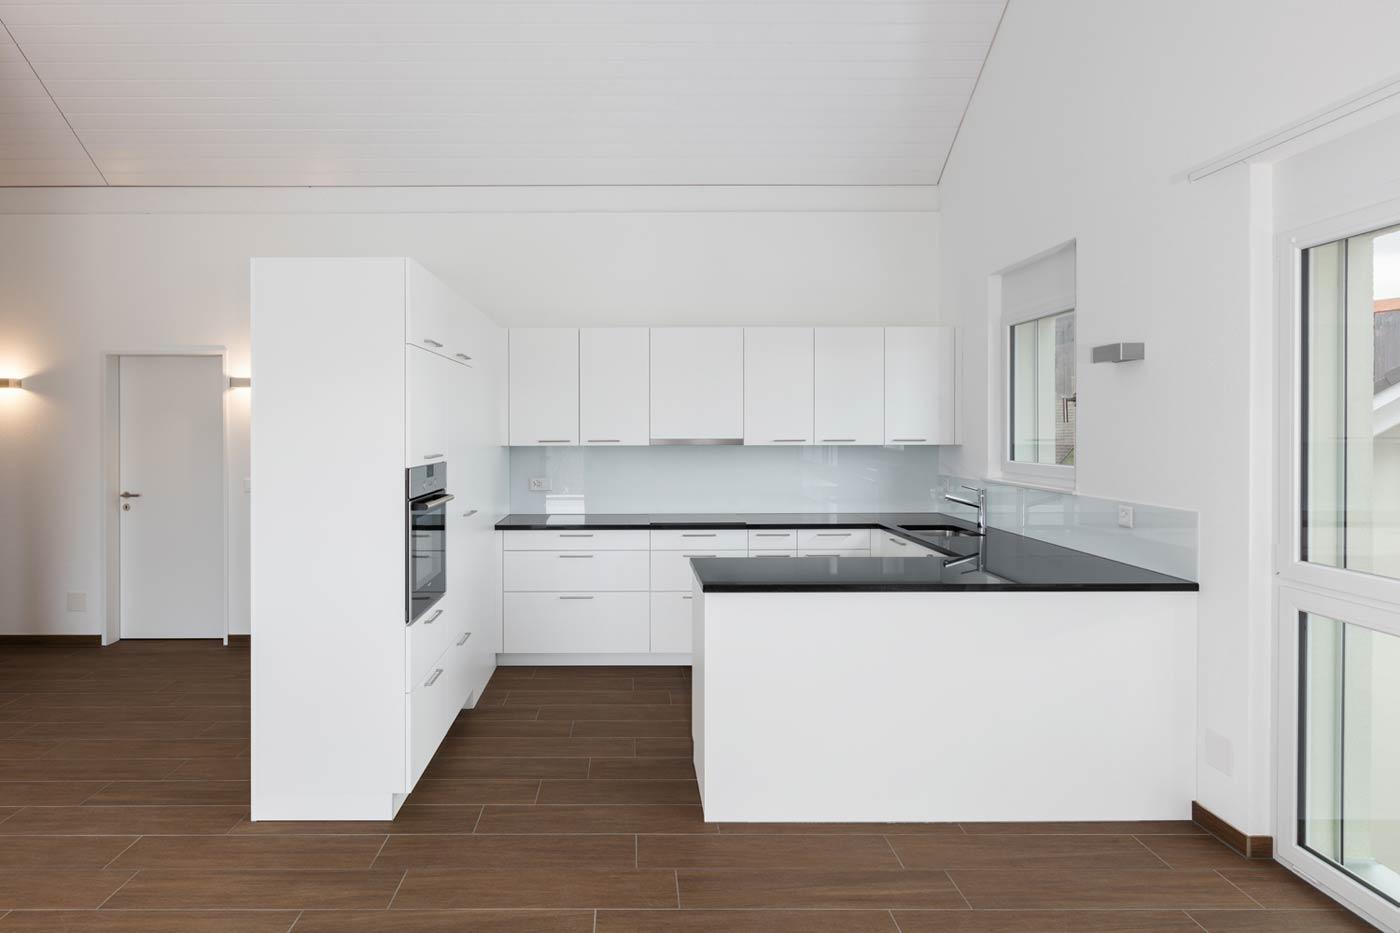 Quadratische Küche